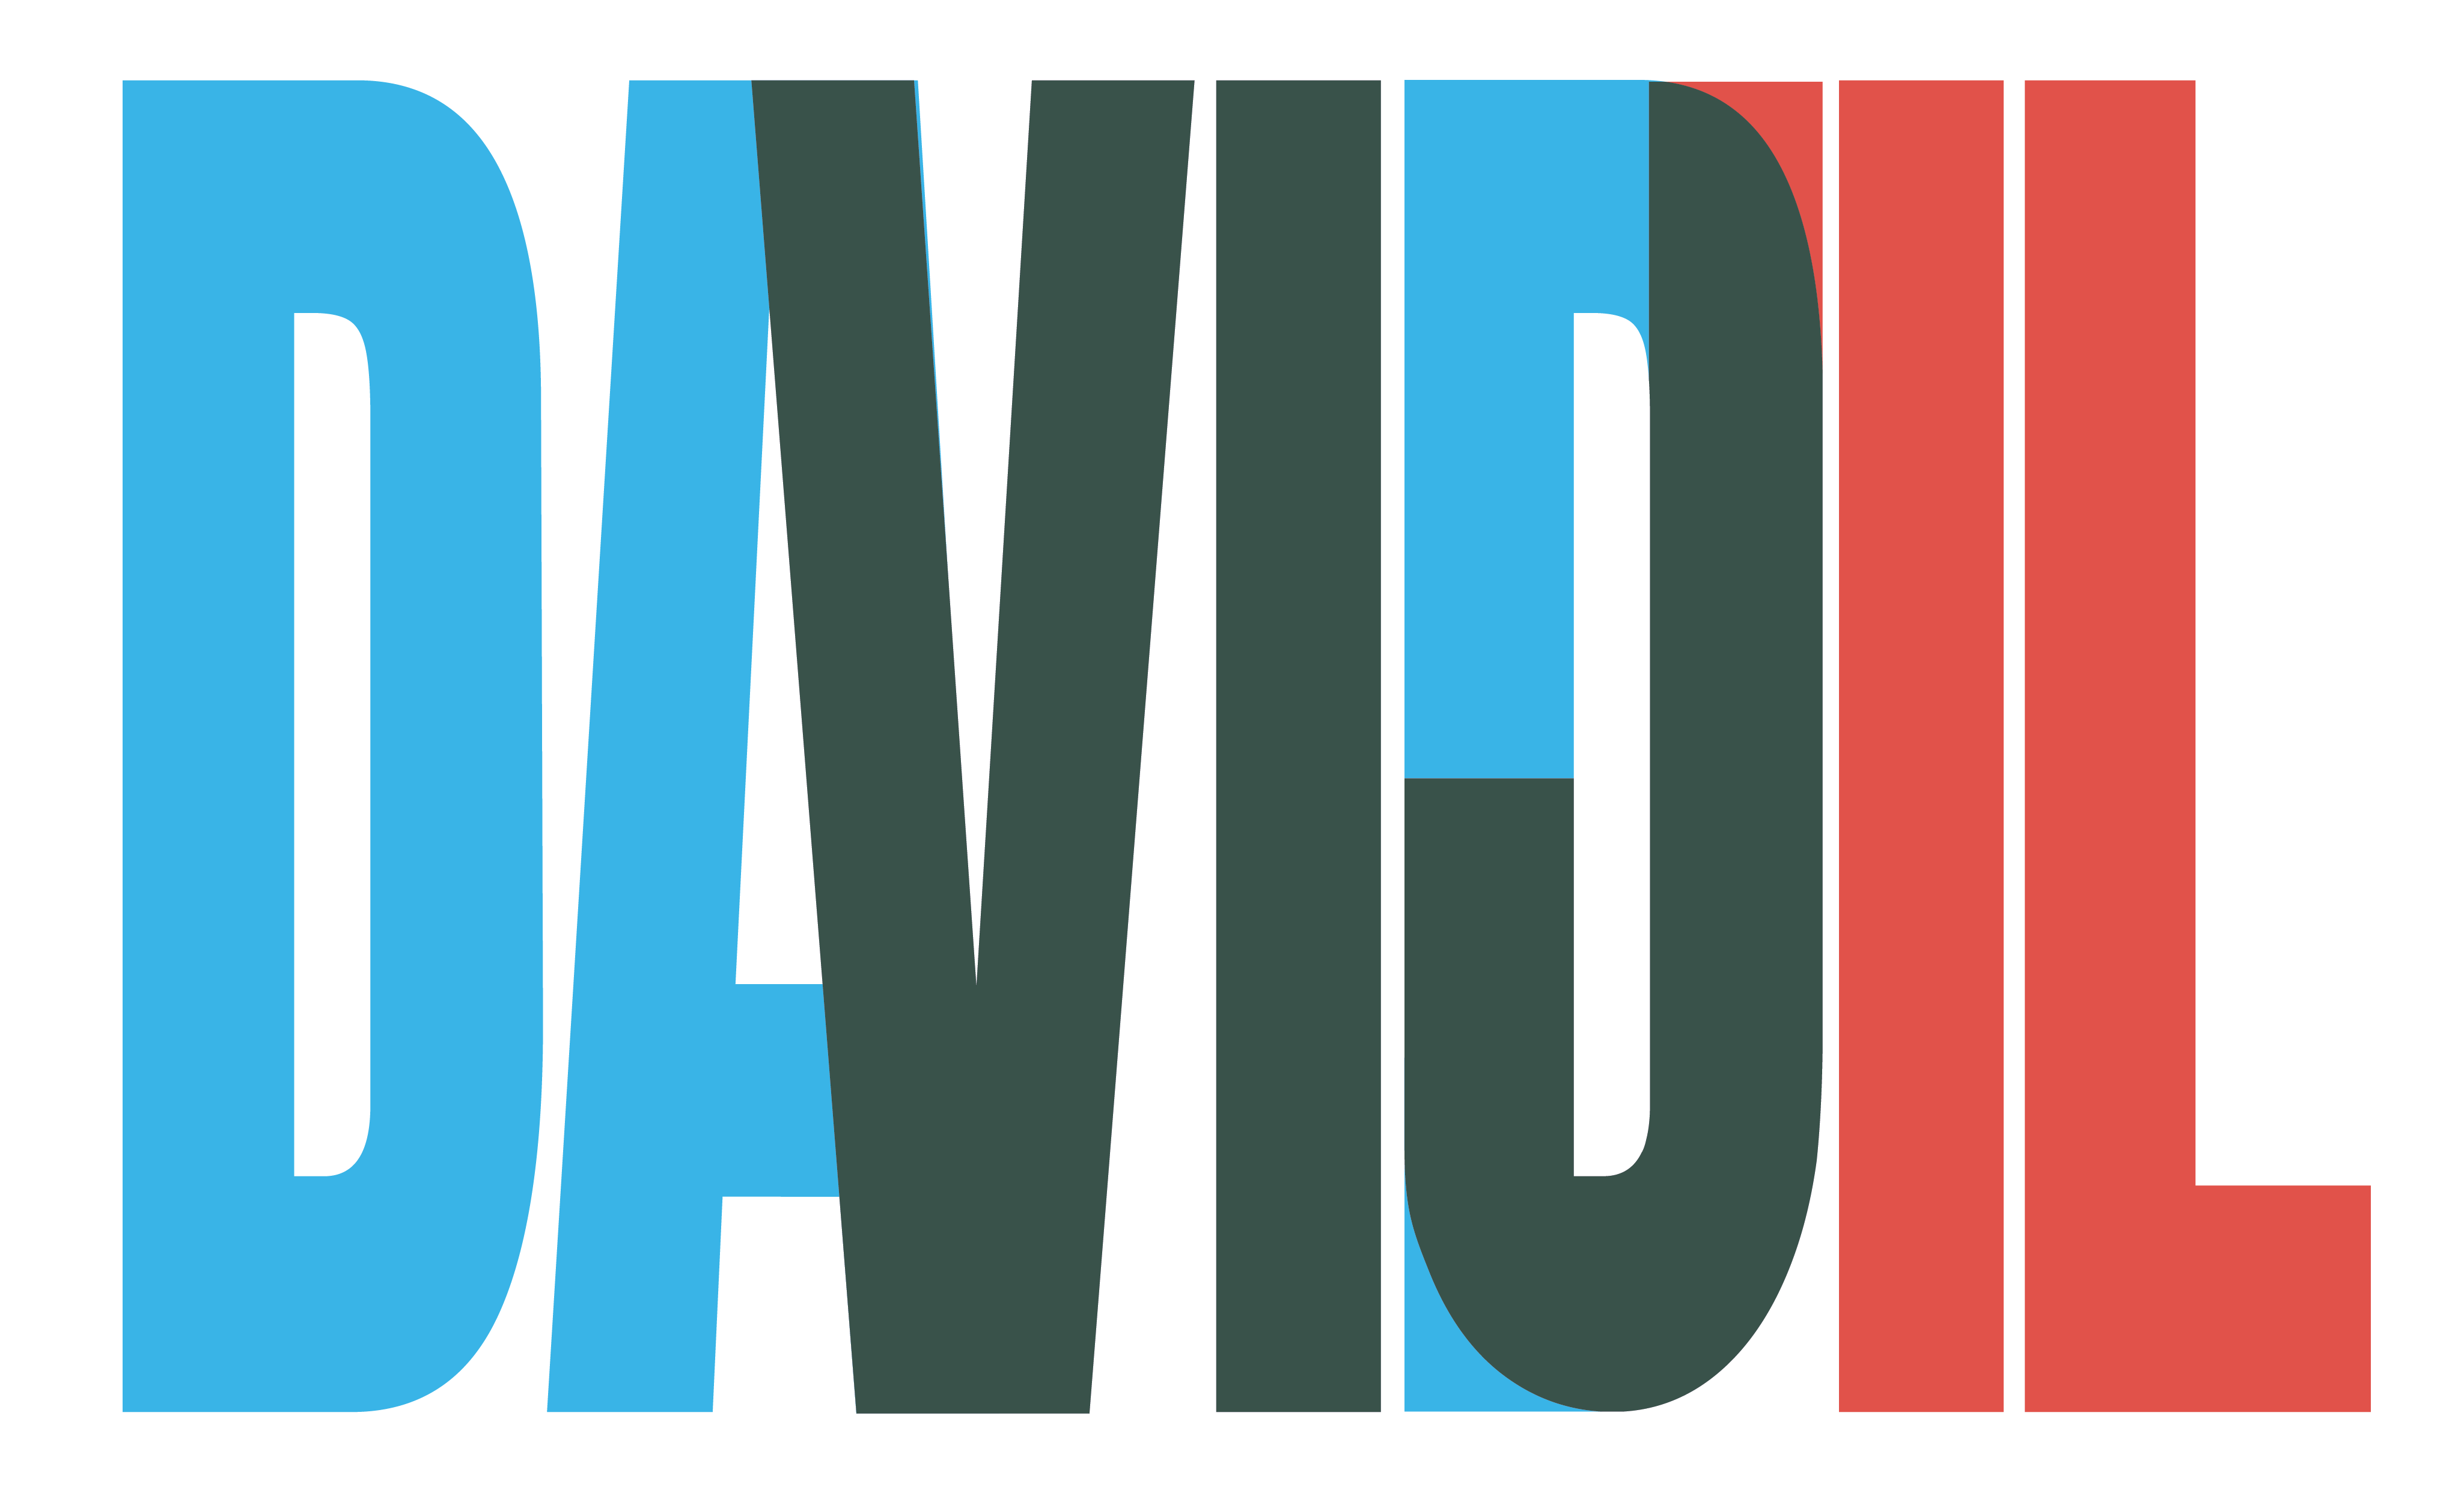 davidvijil.com